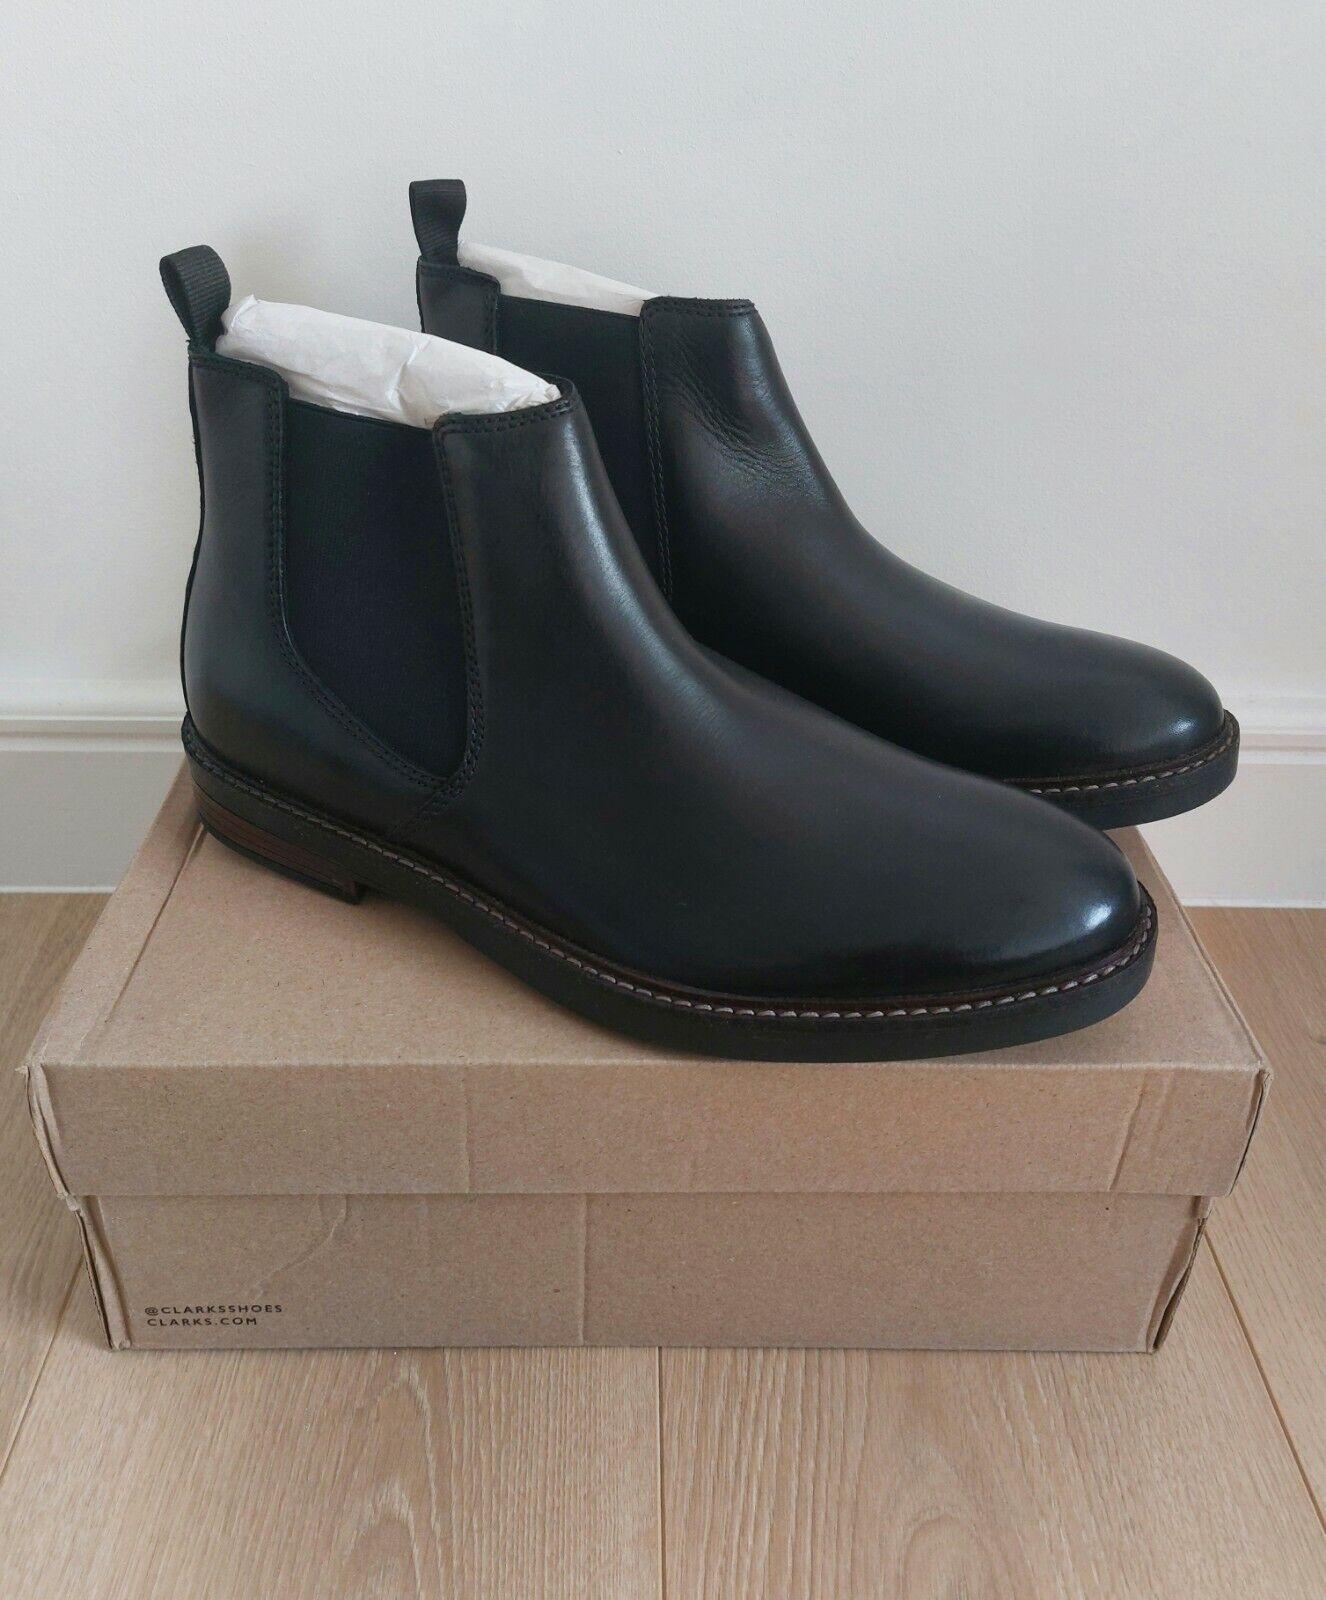 Clarks Mens Chelsea Boots Black Leather PAULSON UP UK Size 8.5 US 9.5 EUR 42.5